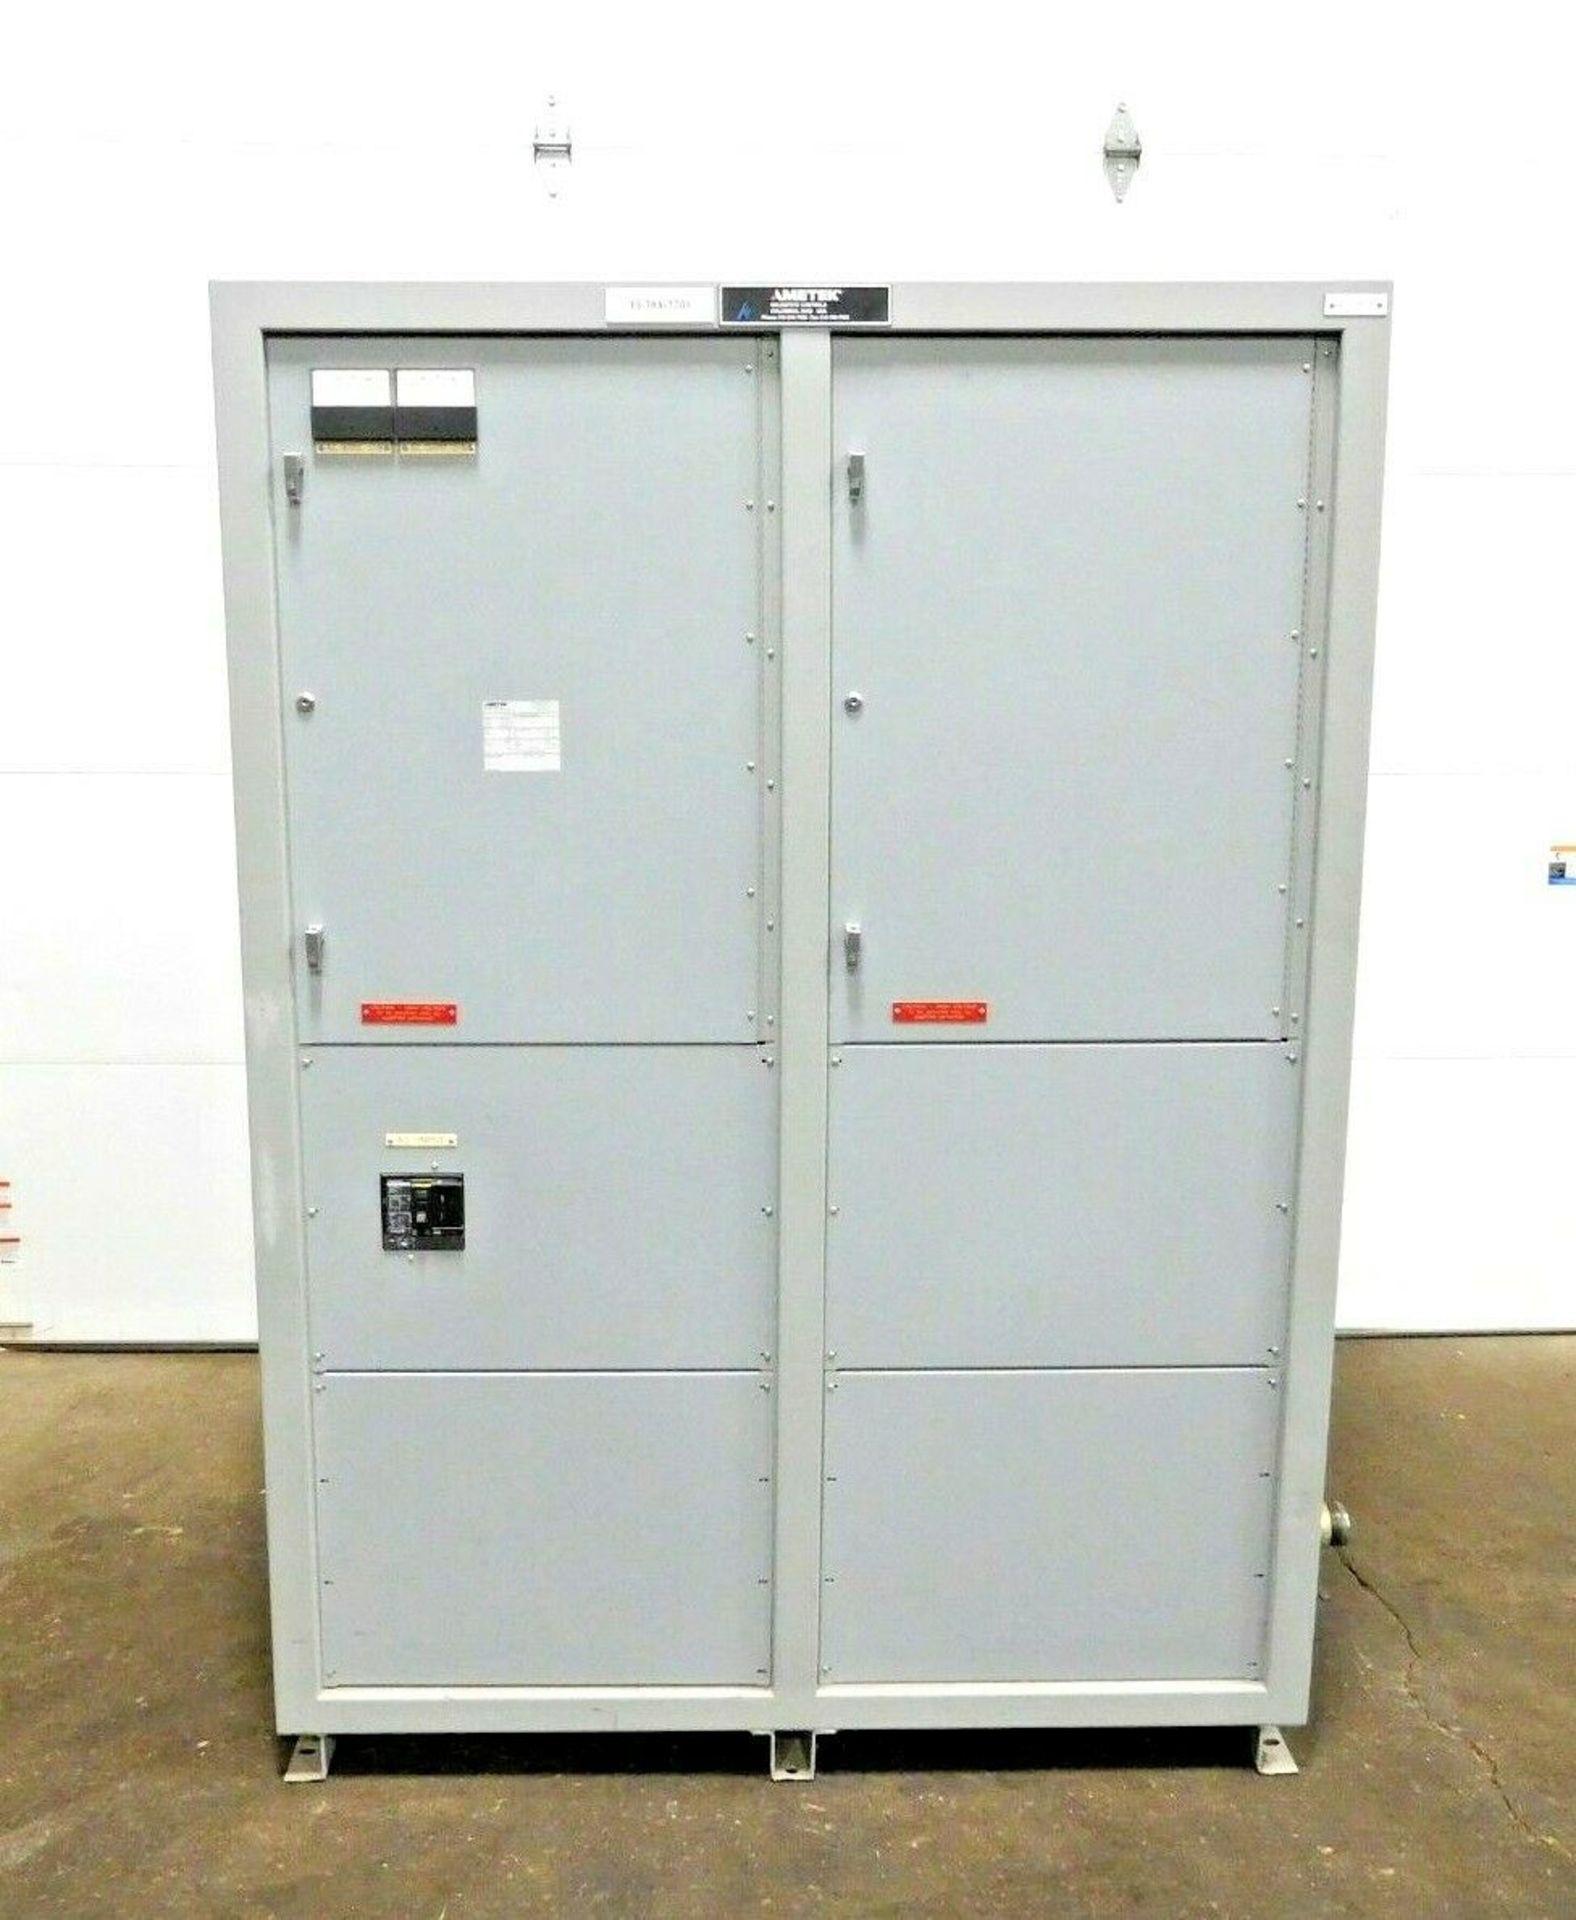 Ametek Solid State Controls 37.5 KVA Regulating Transformer. 1 Ph.